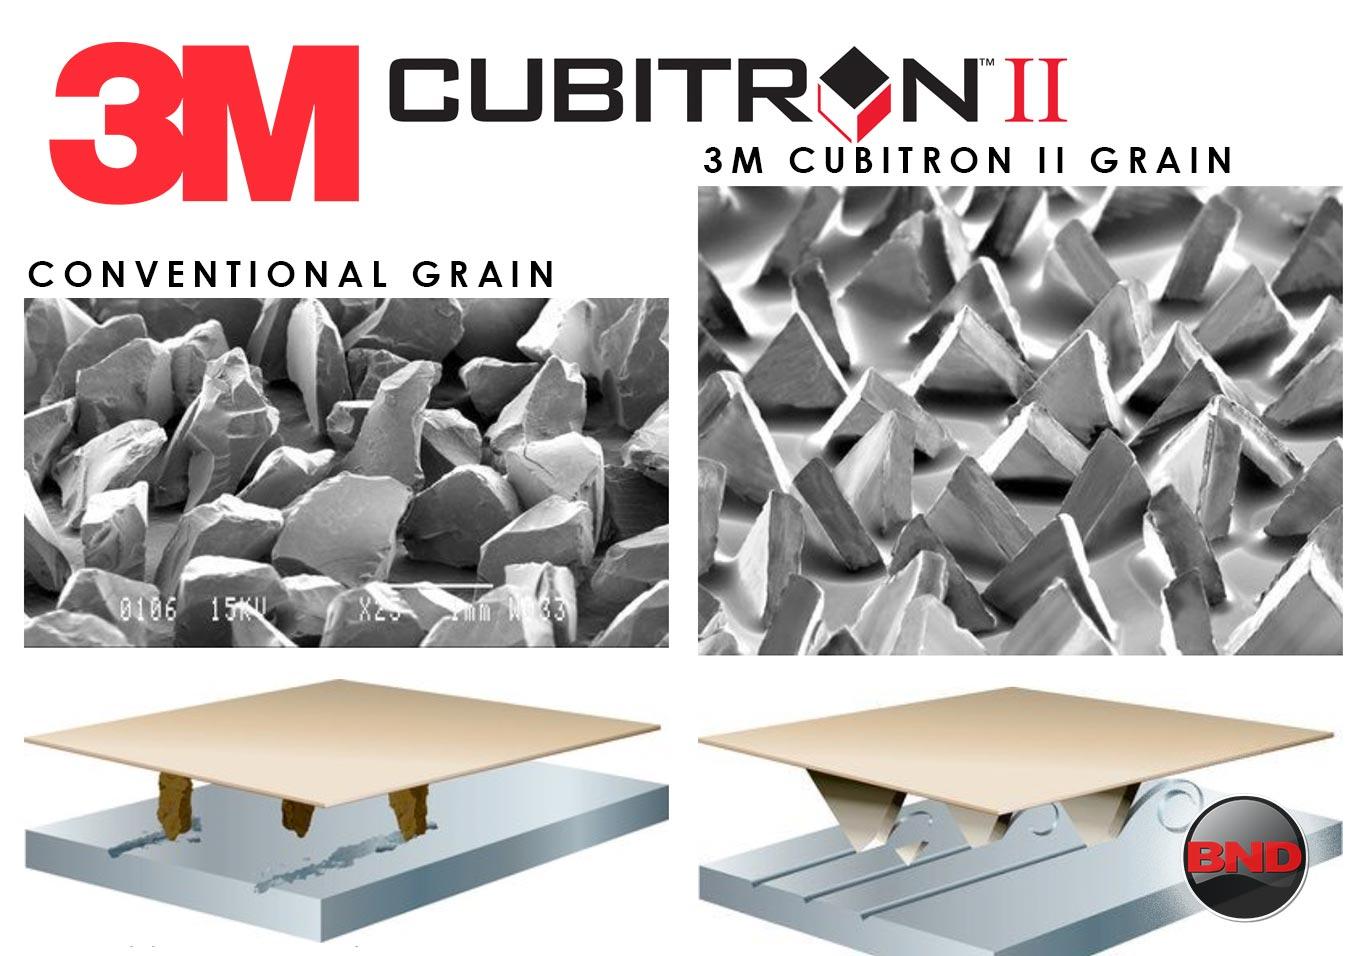 Why use 3M Cubitron II?